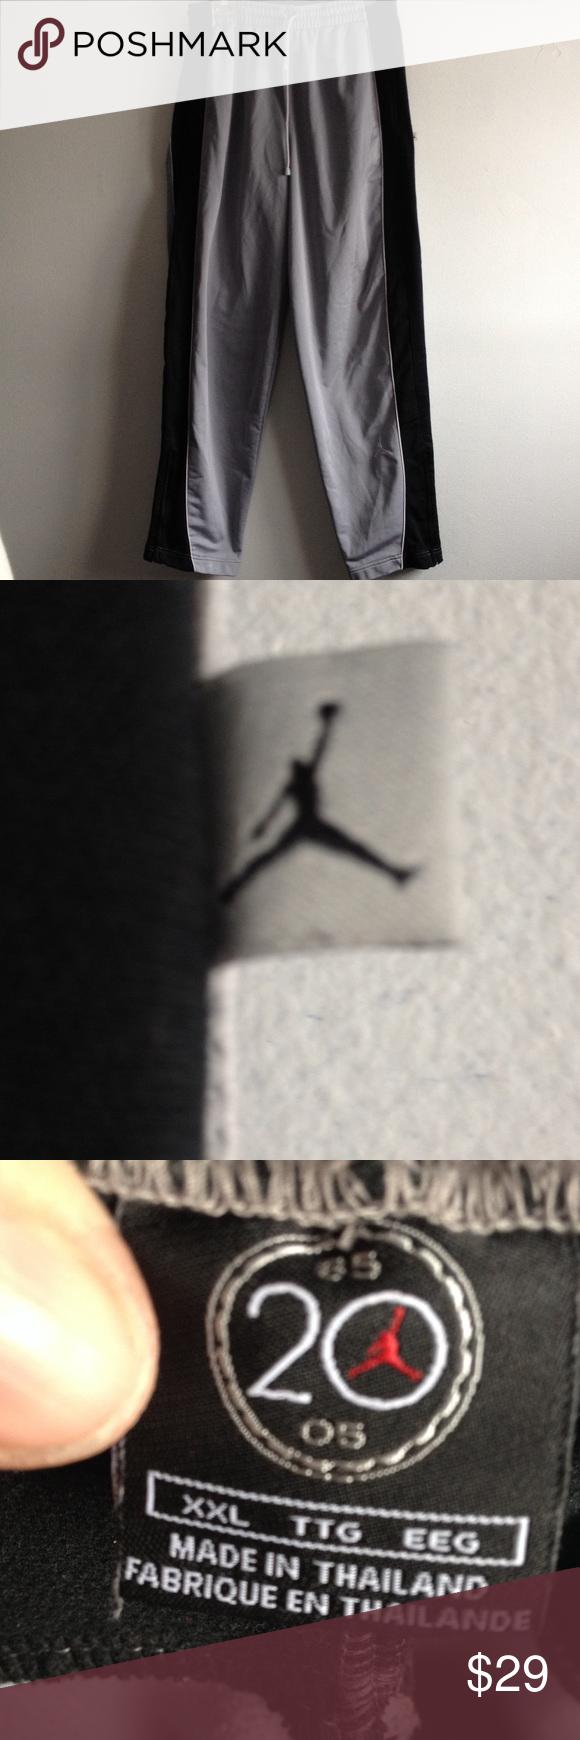 ff587b9f1cc2 Michael Jordan Men s XXL Sweatpants Joggers Men s gray with black Jordan  sweatpants featuring iconic jumping man. Size XXL